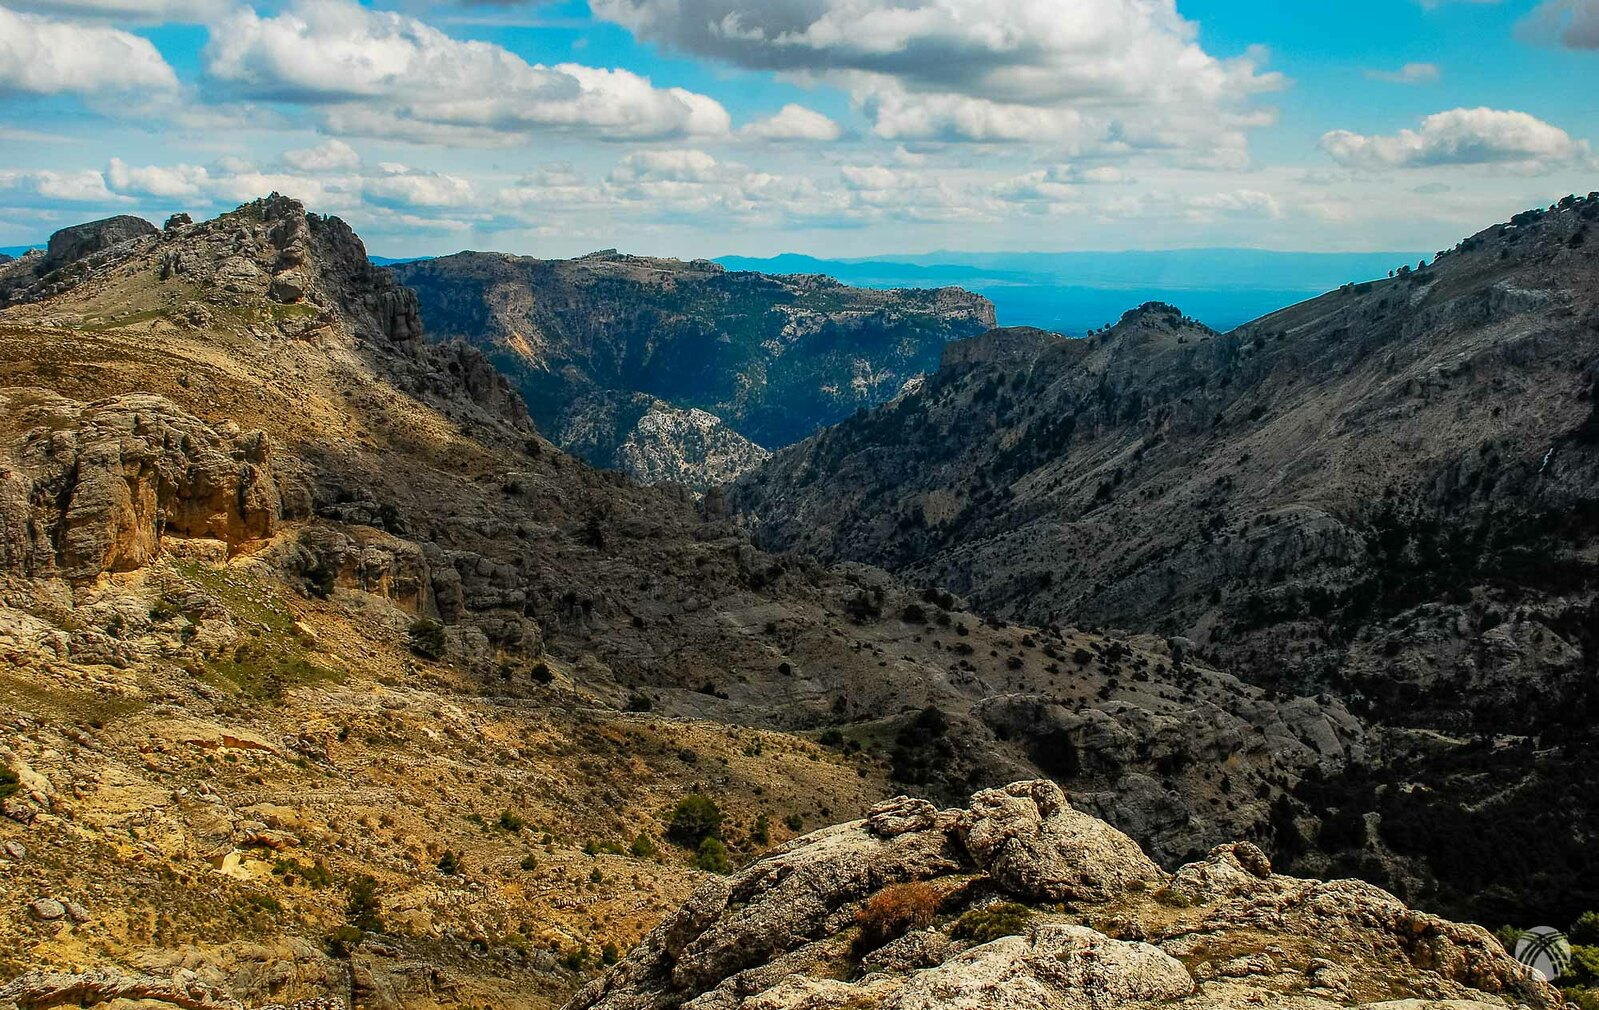 Última vista hacia el Barranco. Se aprecia la cumbre del Puntal de la Zurdica